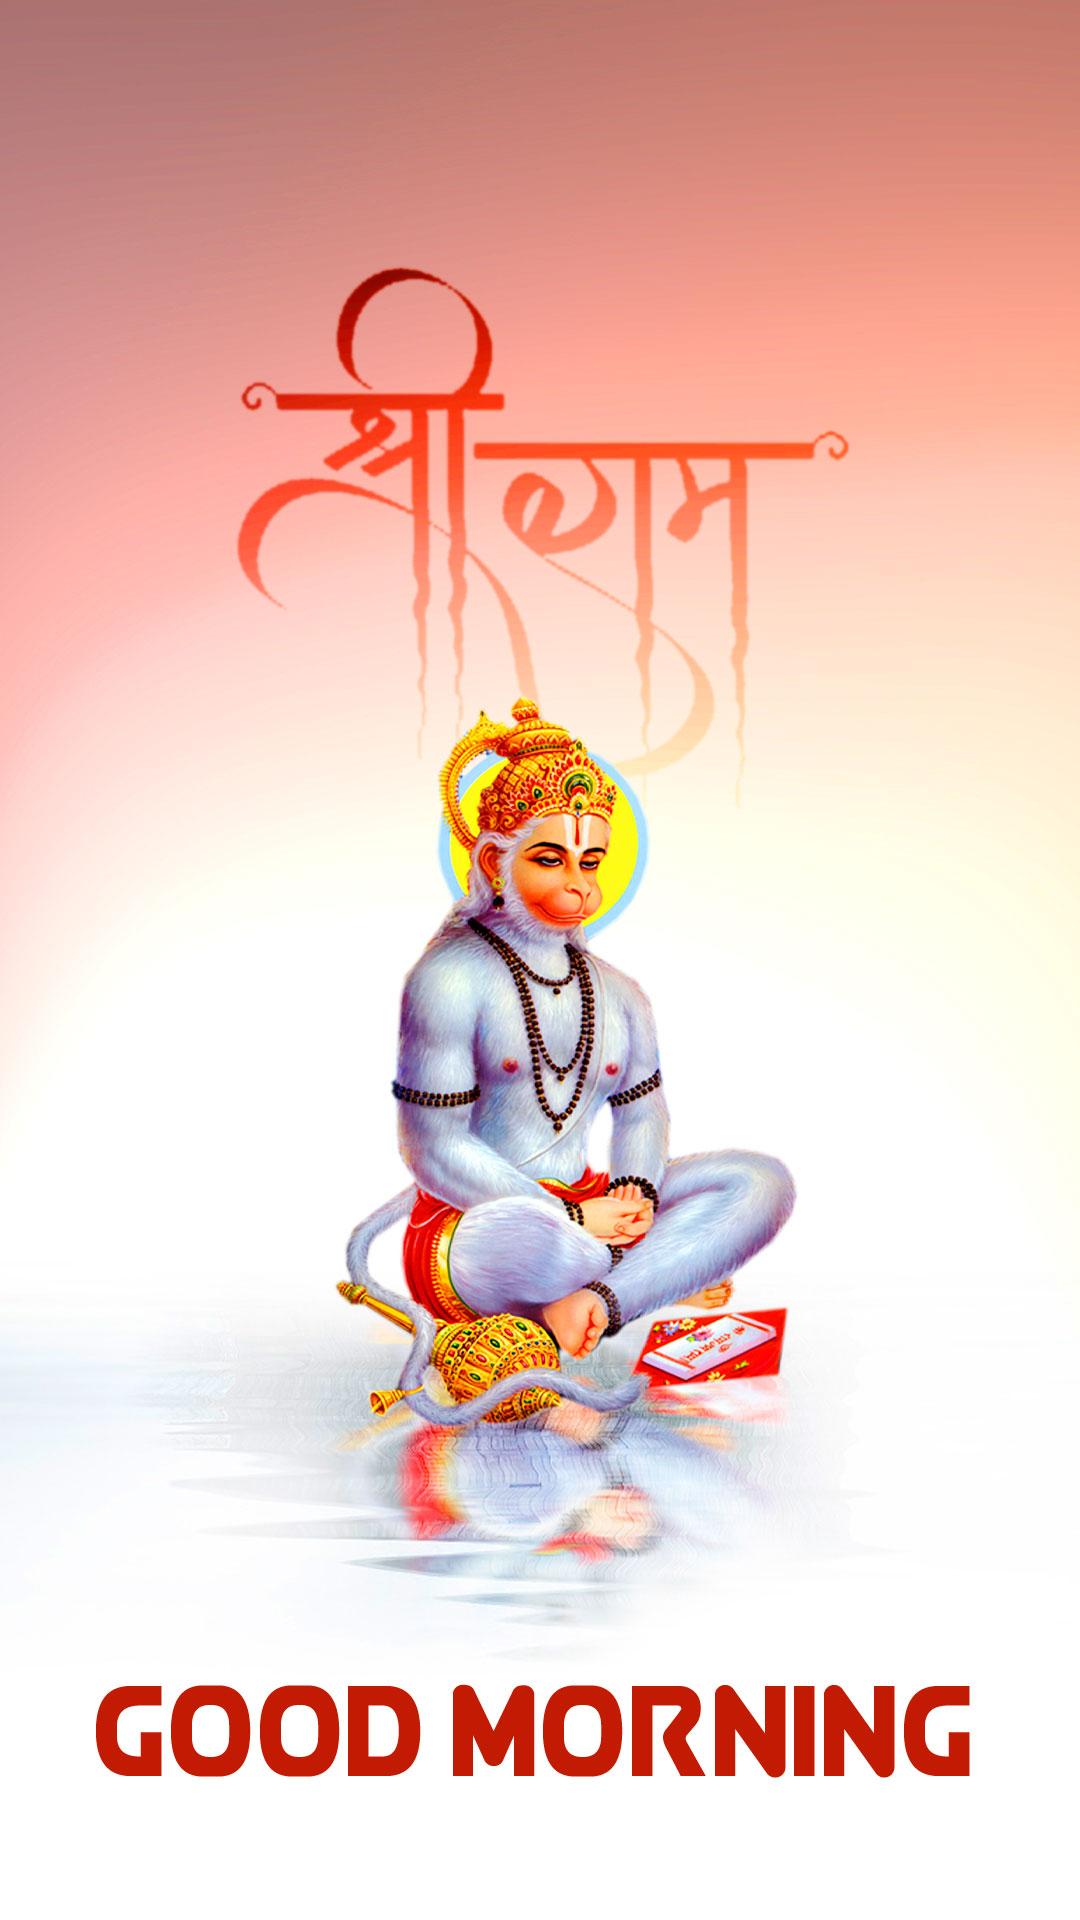 Fresh hanuman ji Good Morning Images